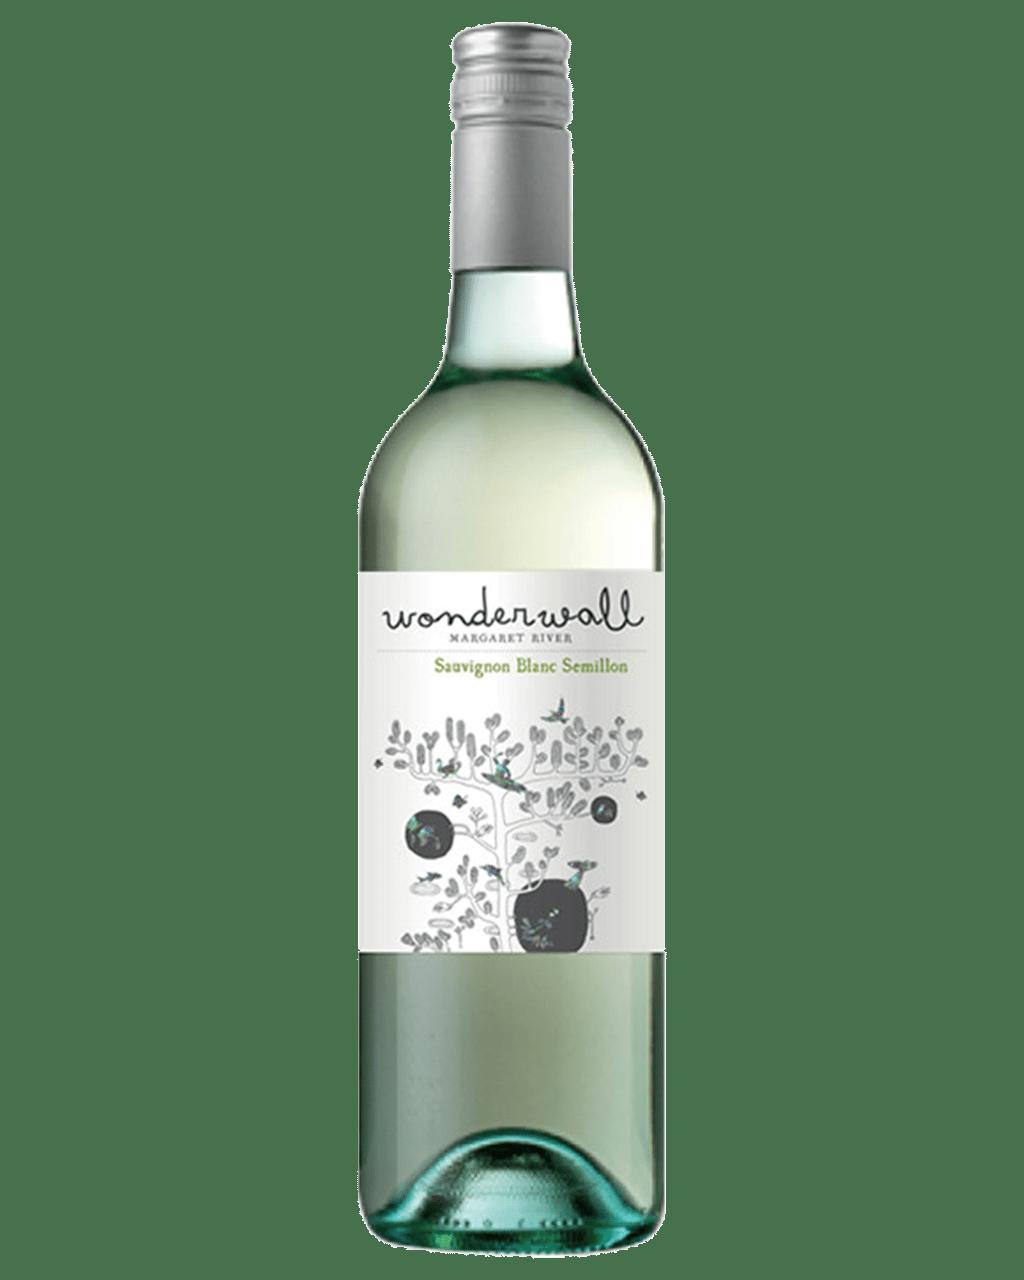 best service 6f111 2278b Wonderwall Margaret River Sauvignon Blanc Semillon 2014